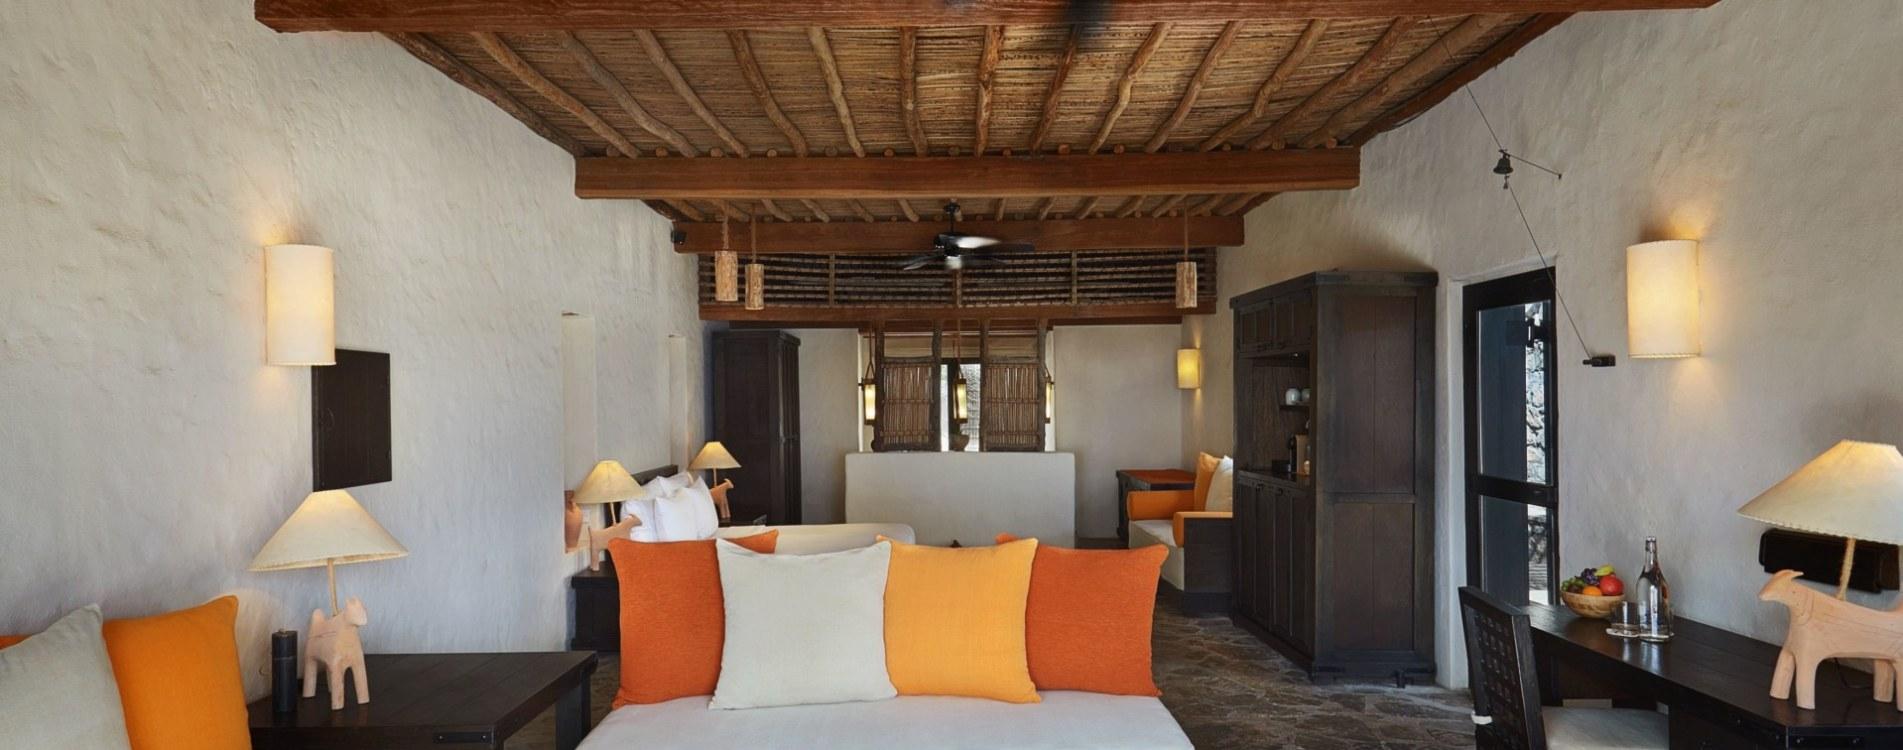 Six-Senses-Zighy-Bay-Pool-Villa-Beachfront-Wohnzimmer-Interior-Oman.jpg